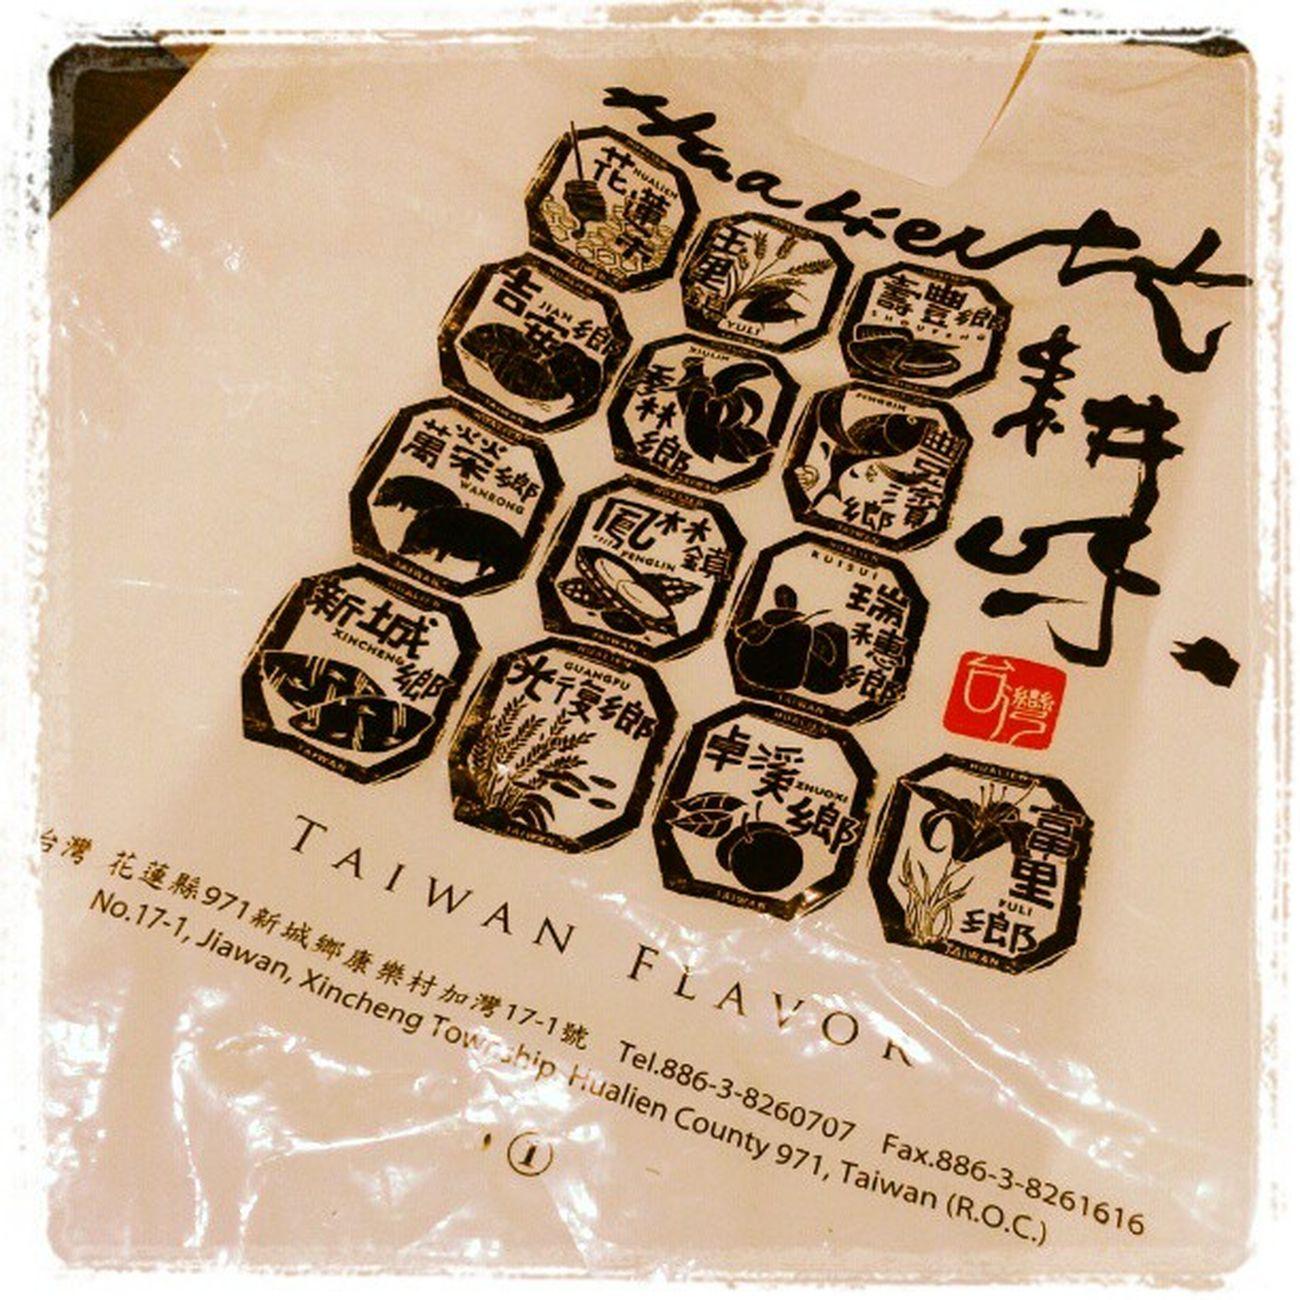 My fondest #memoey of #2012. #travel #taiwan #hualien Taiwan Travel Memory 2012 Hualien Memoey